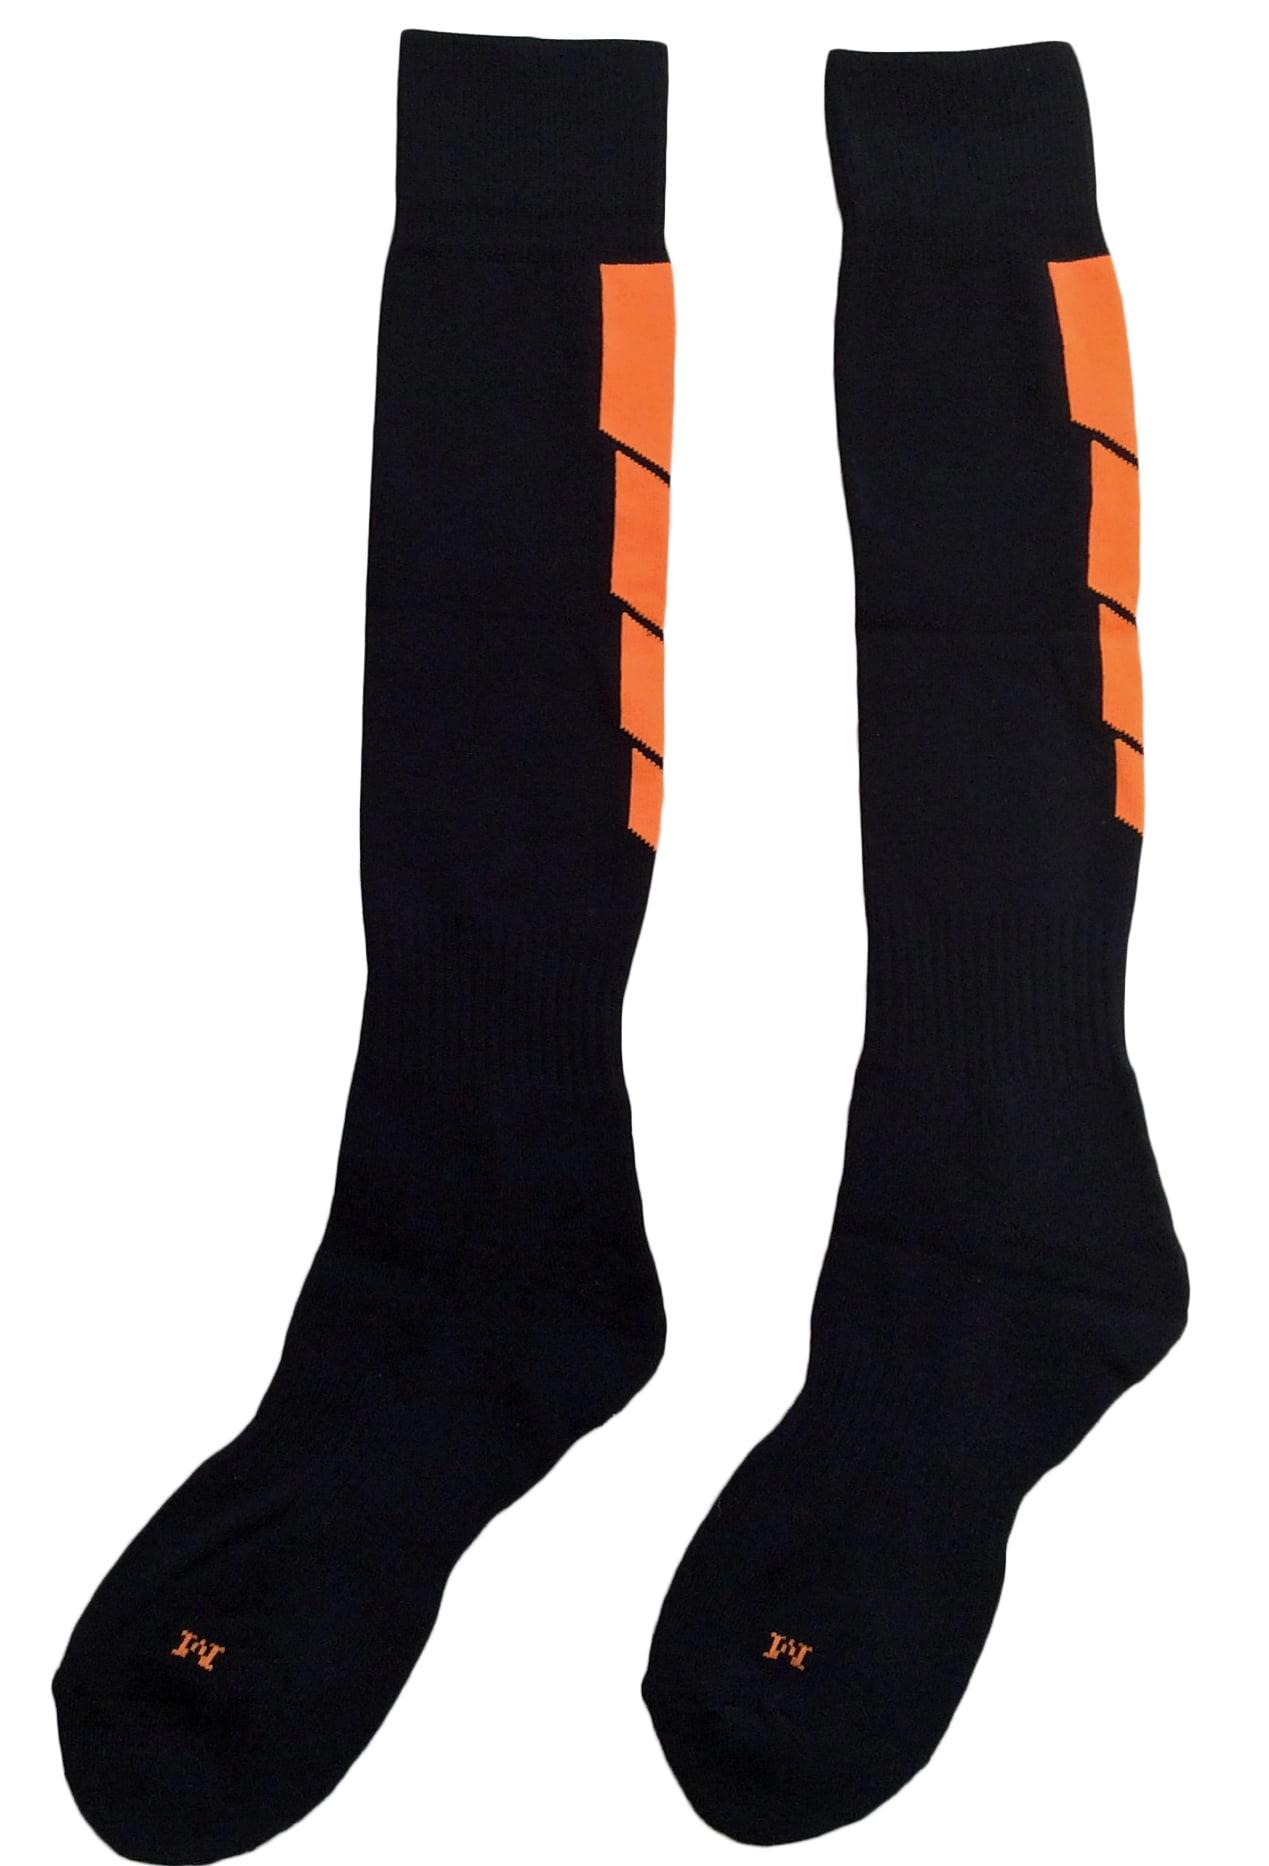 Lian LifeStyle Boys 1 Pair Knee Length Sports Socks Striped Size XS//S//M